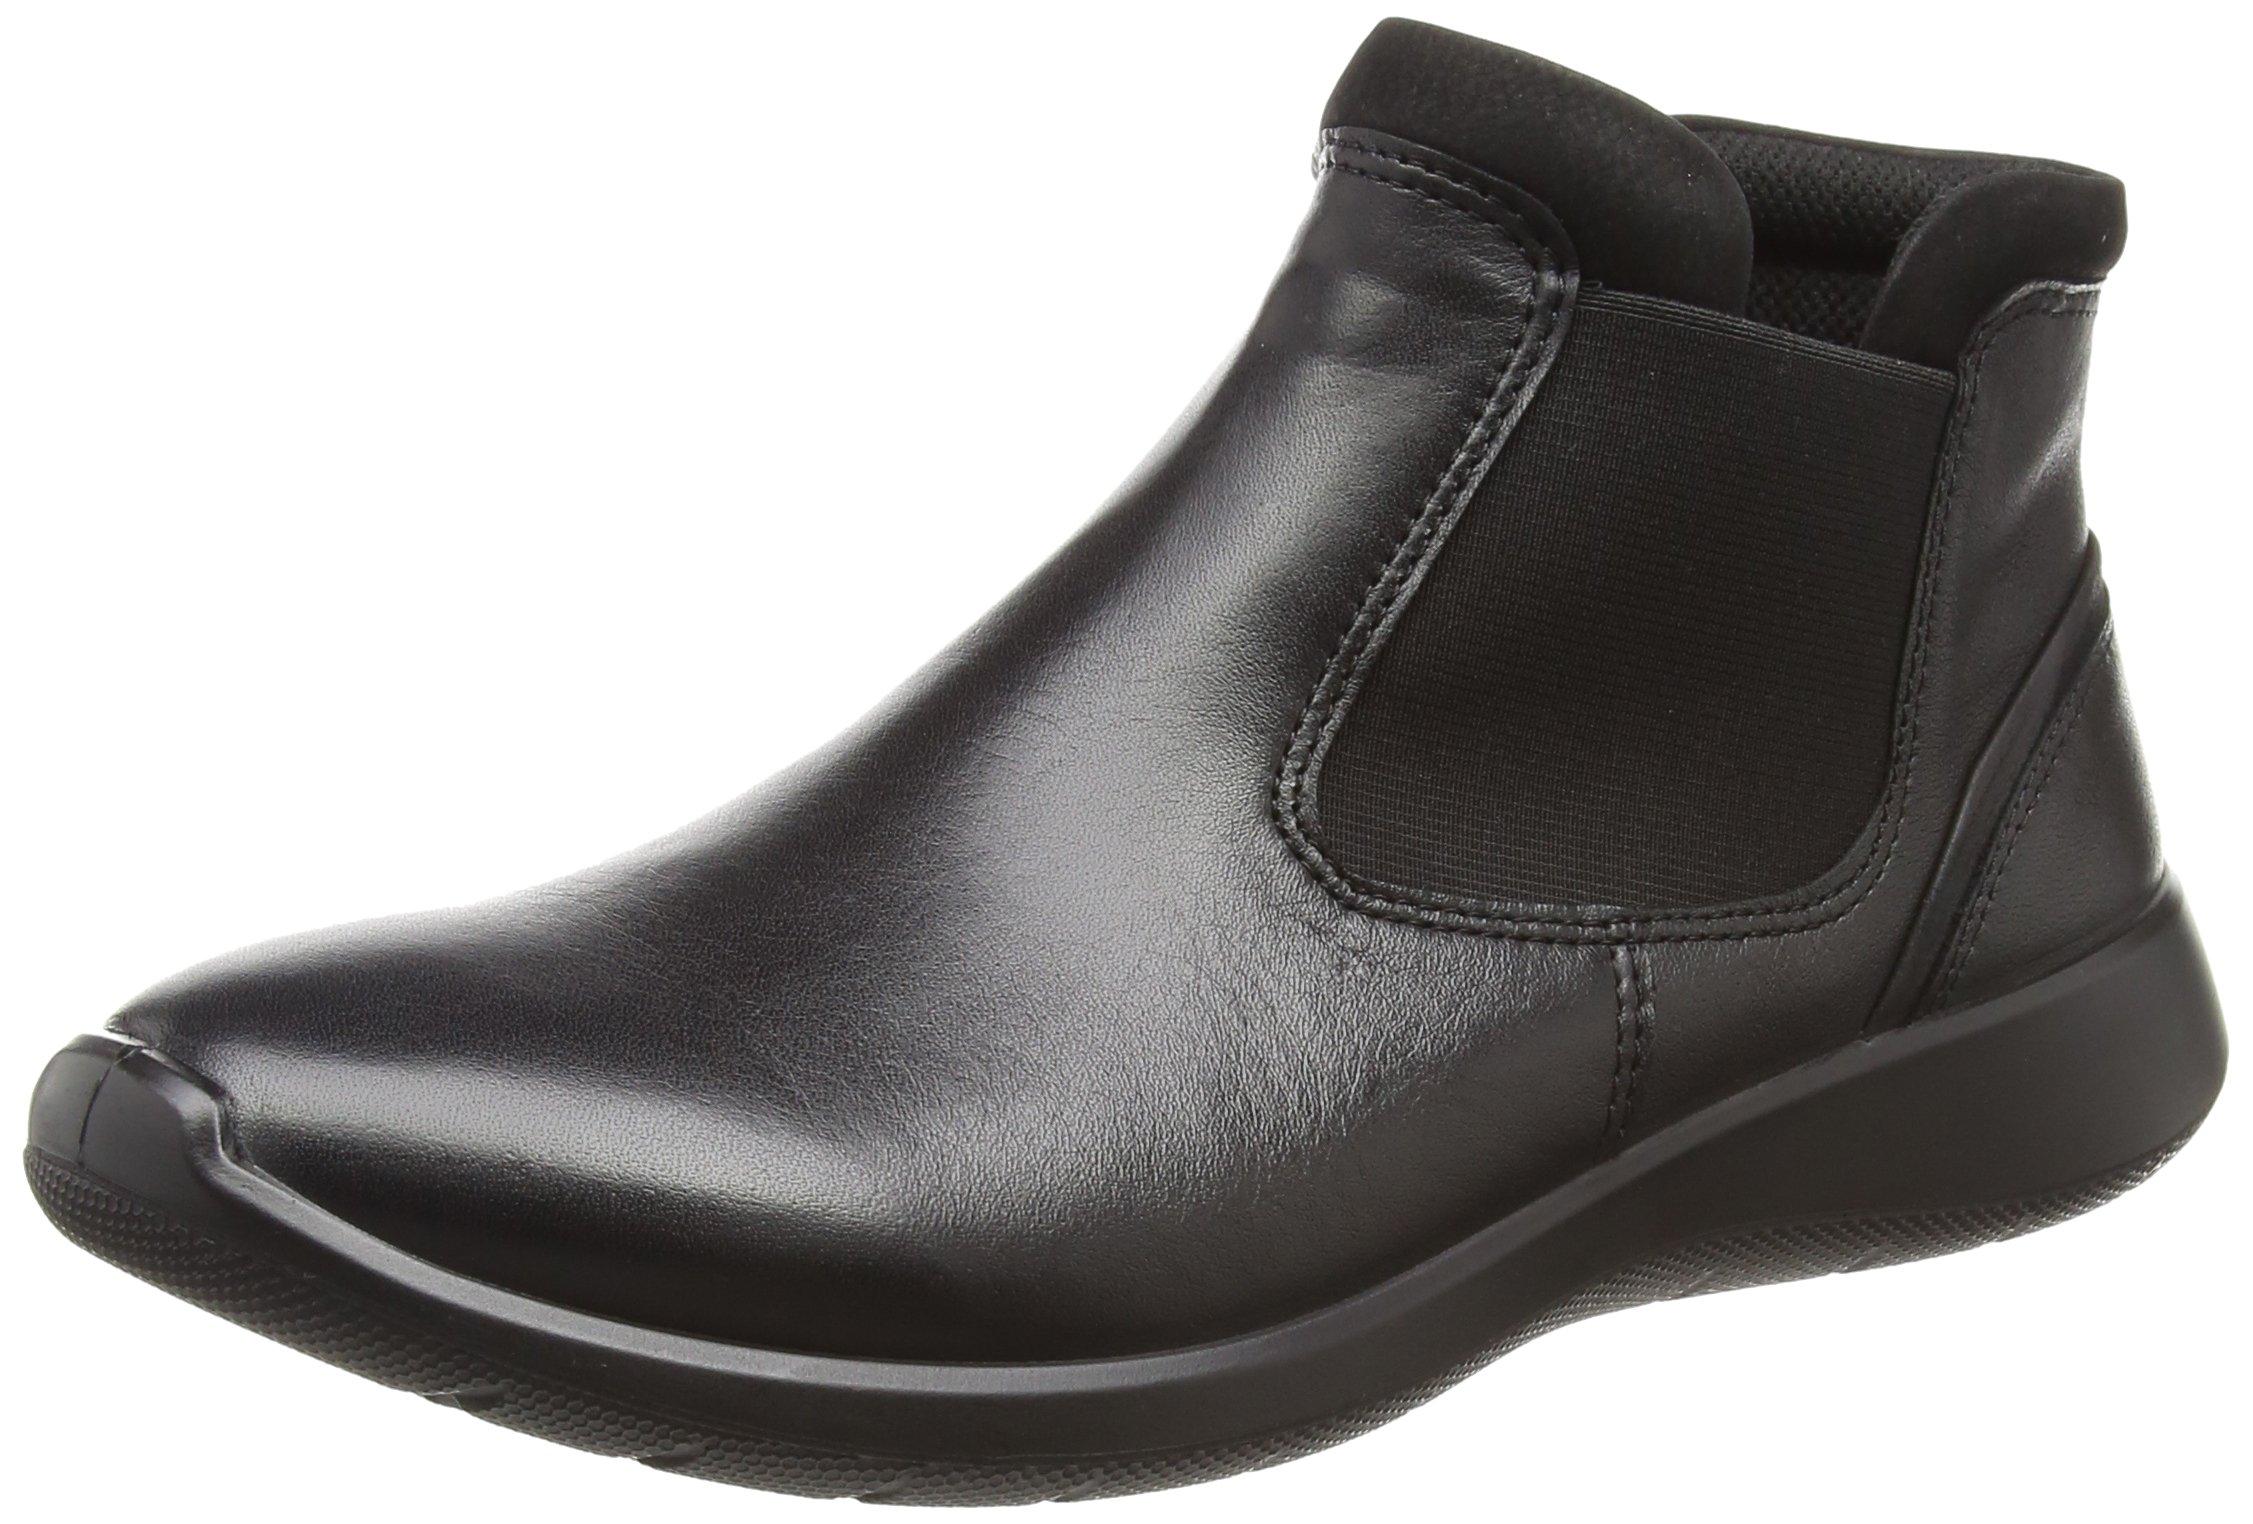 ECCO Women's Women's Soft 5 Low Chelsea Fashion Sneaker, Black/Black, 39 EU/8-8.5 US